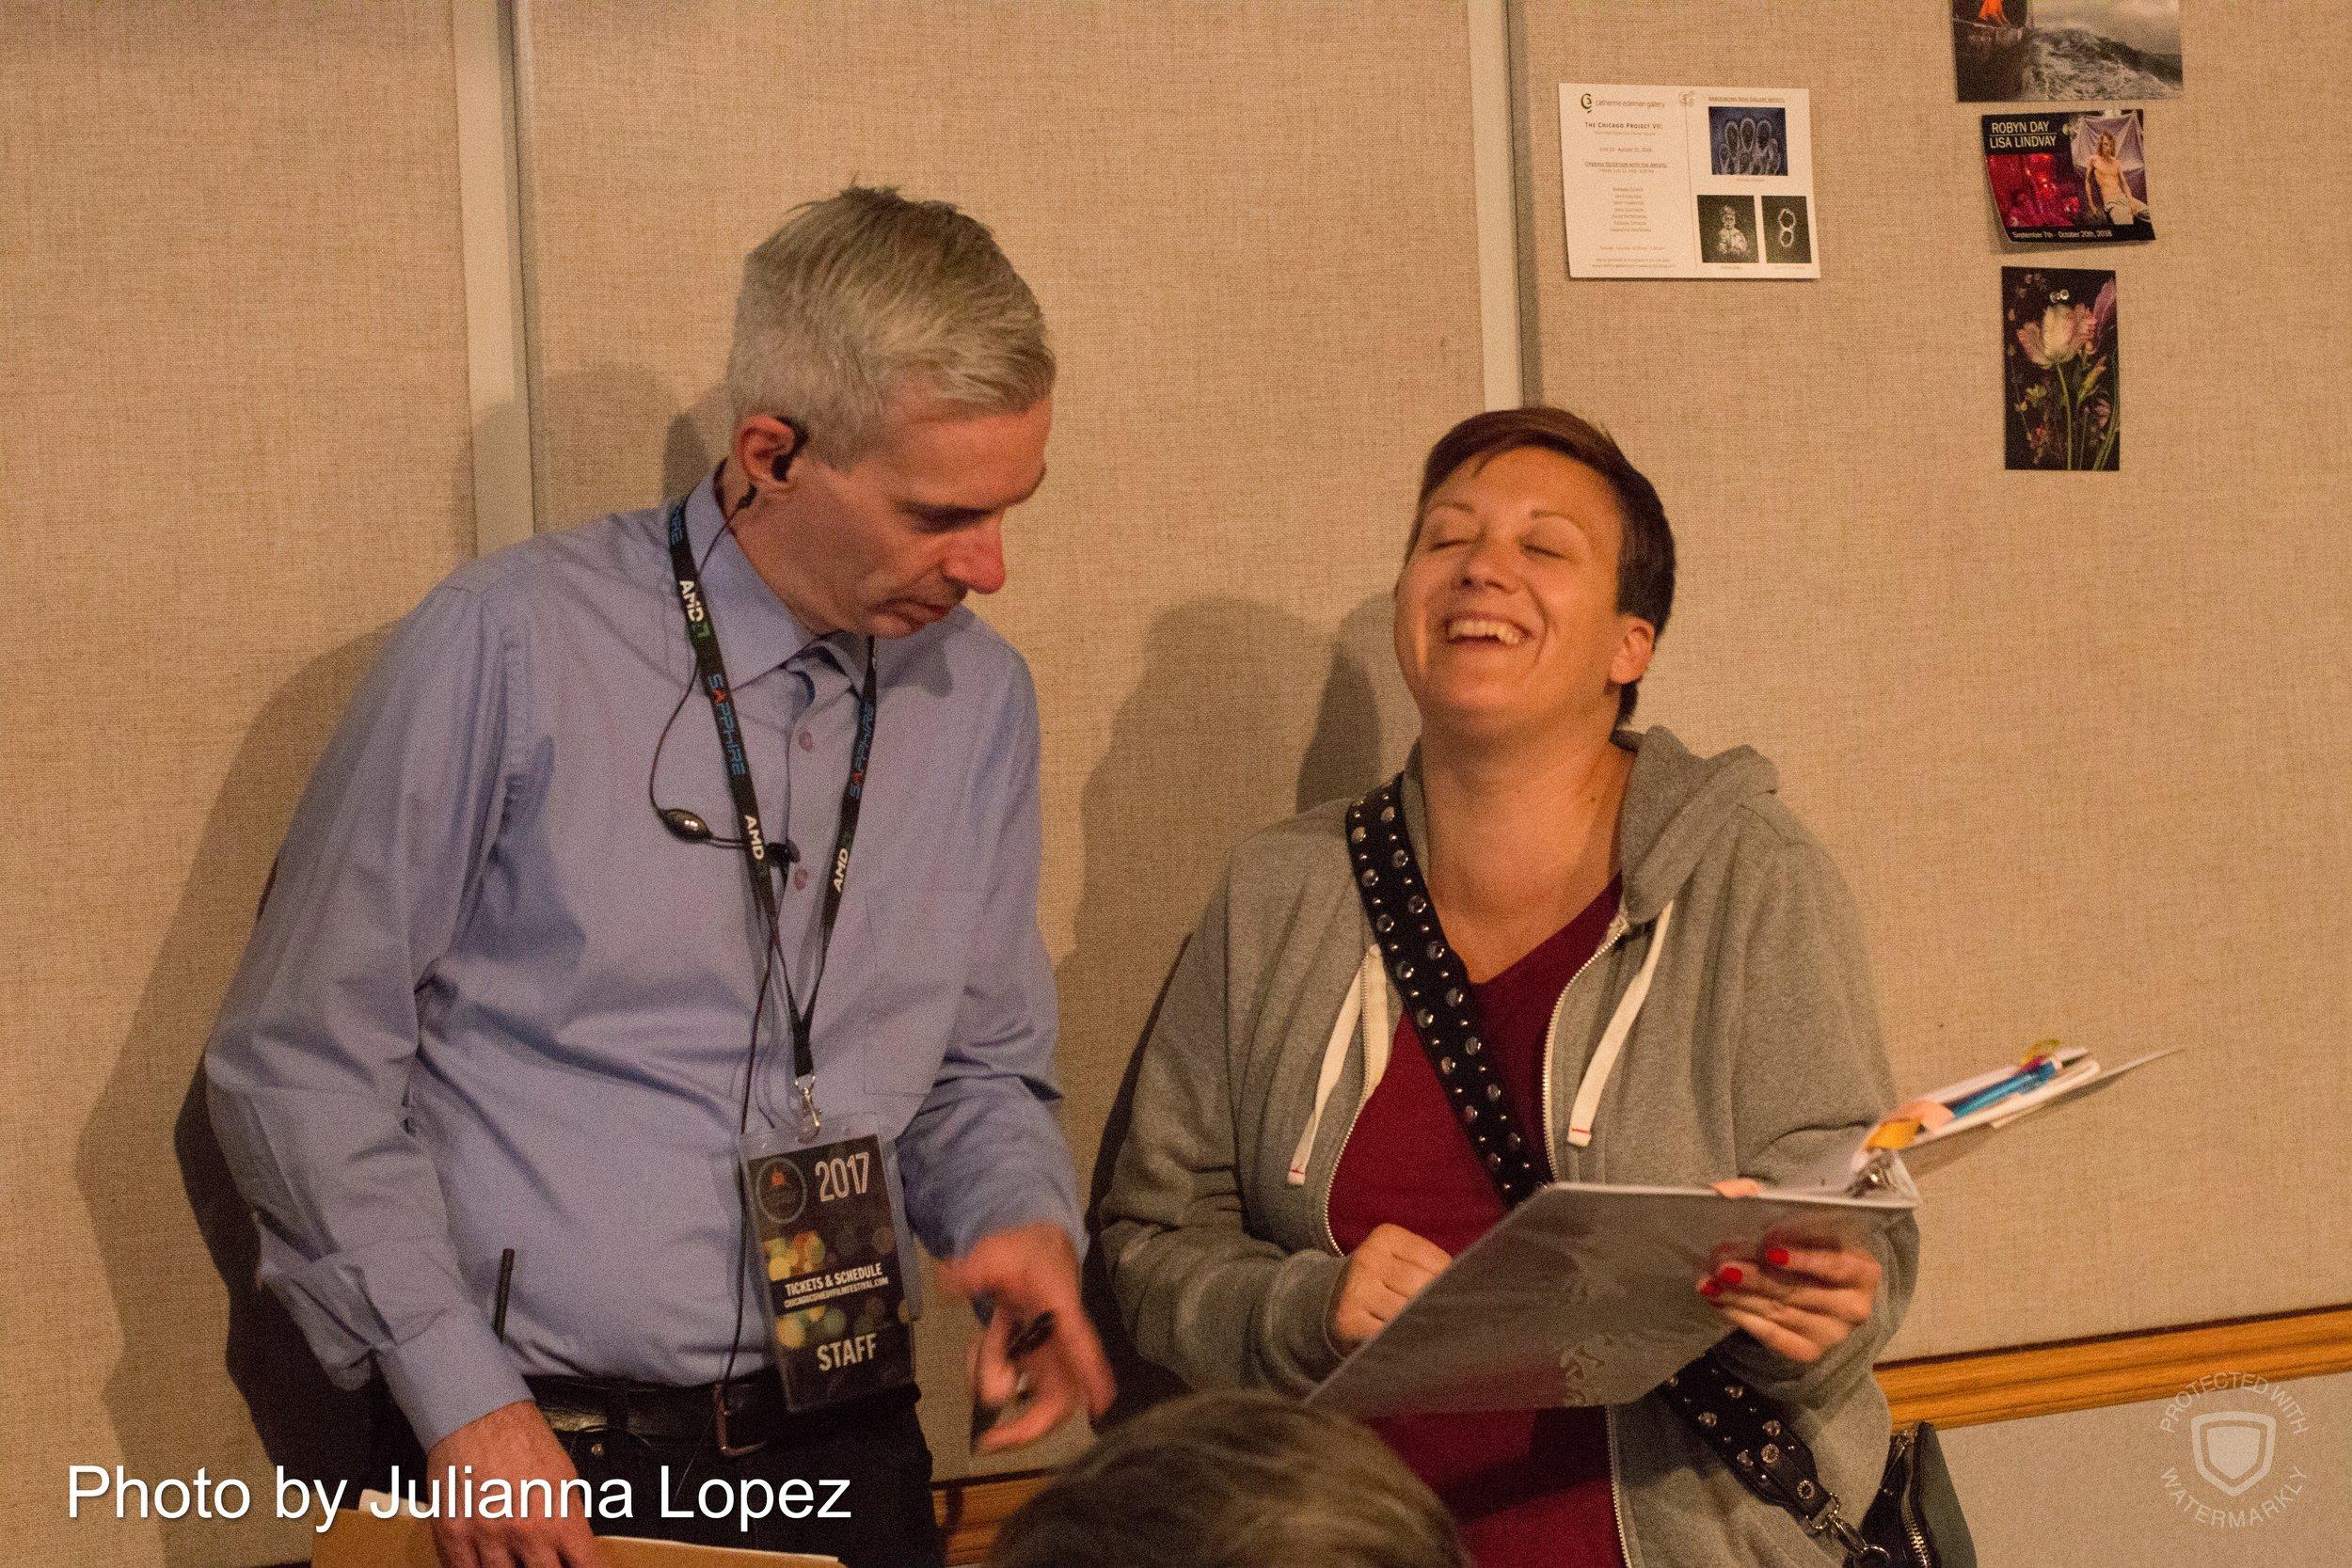 Julianna Lopez - IMG_6348.jpg